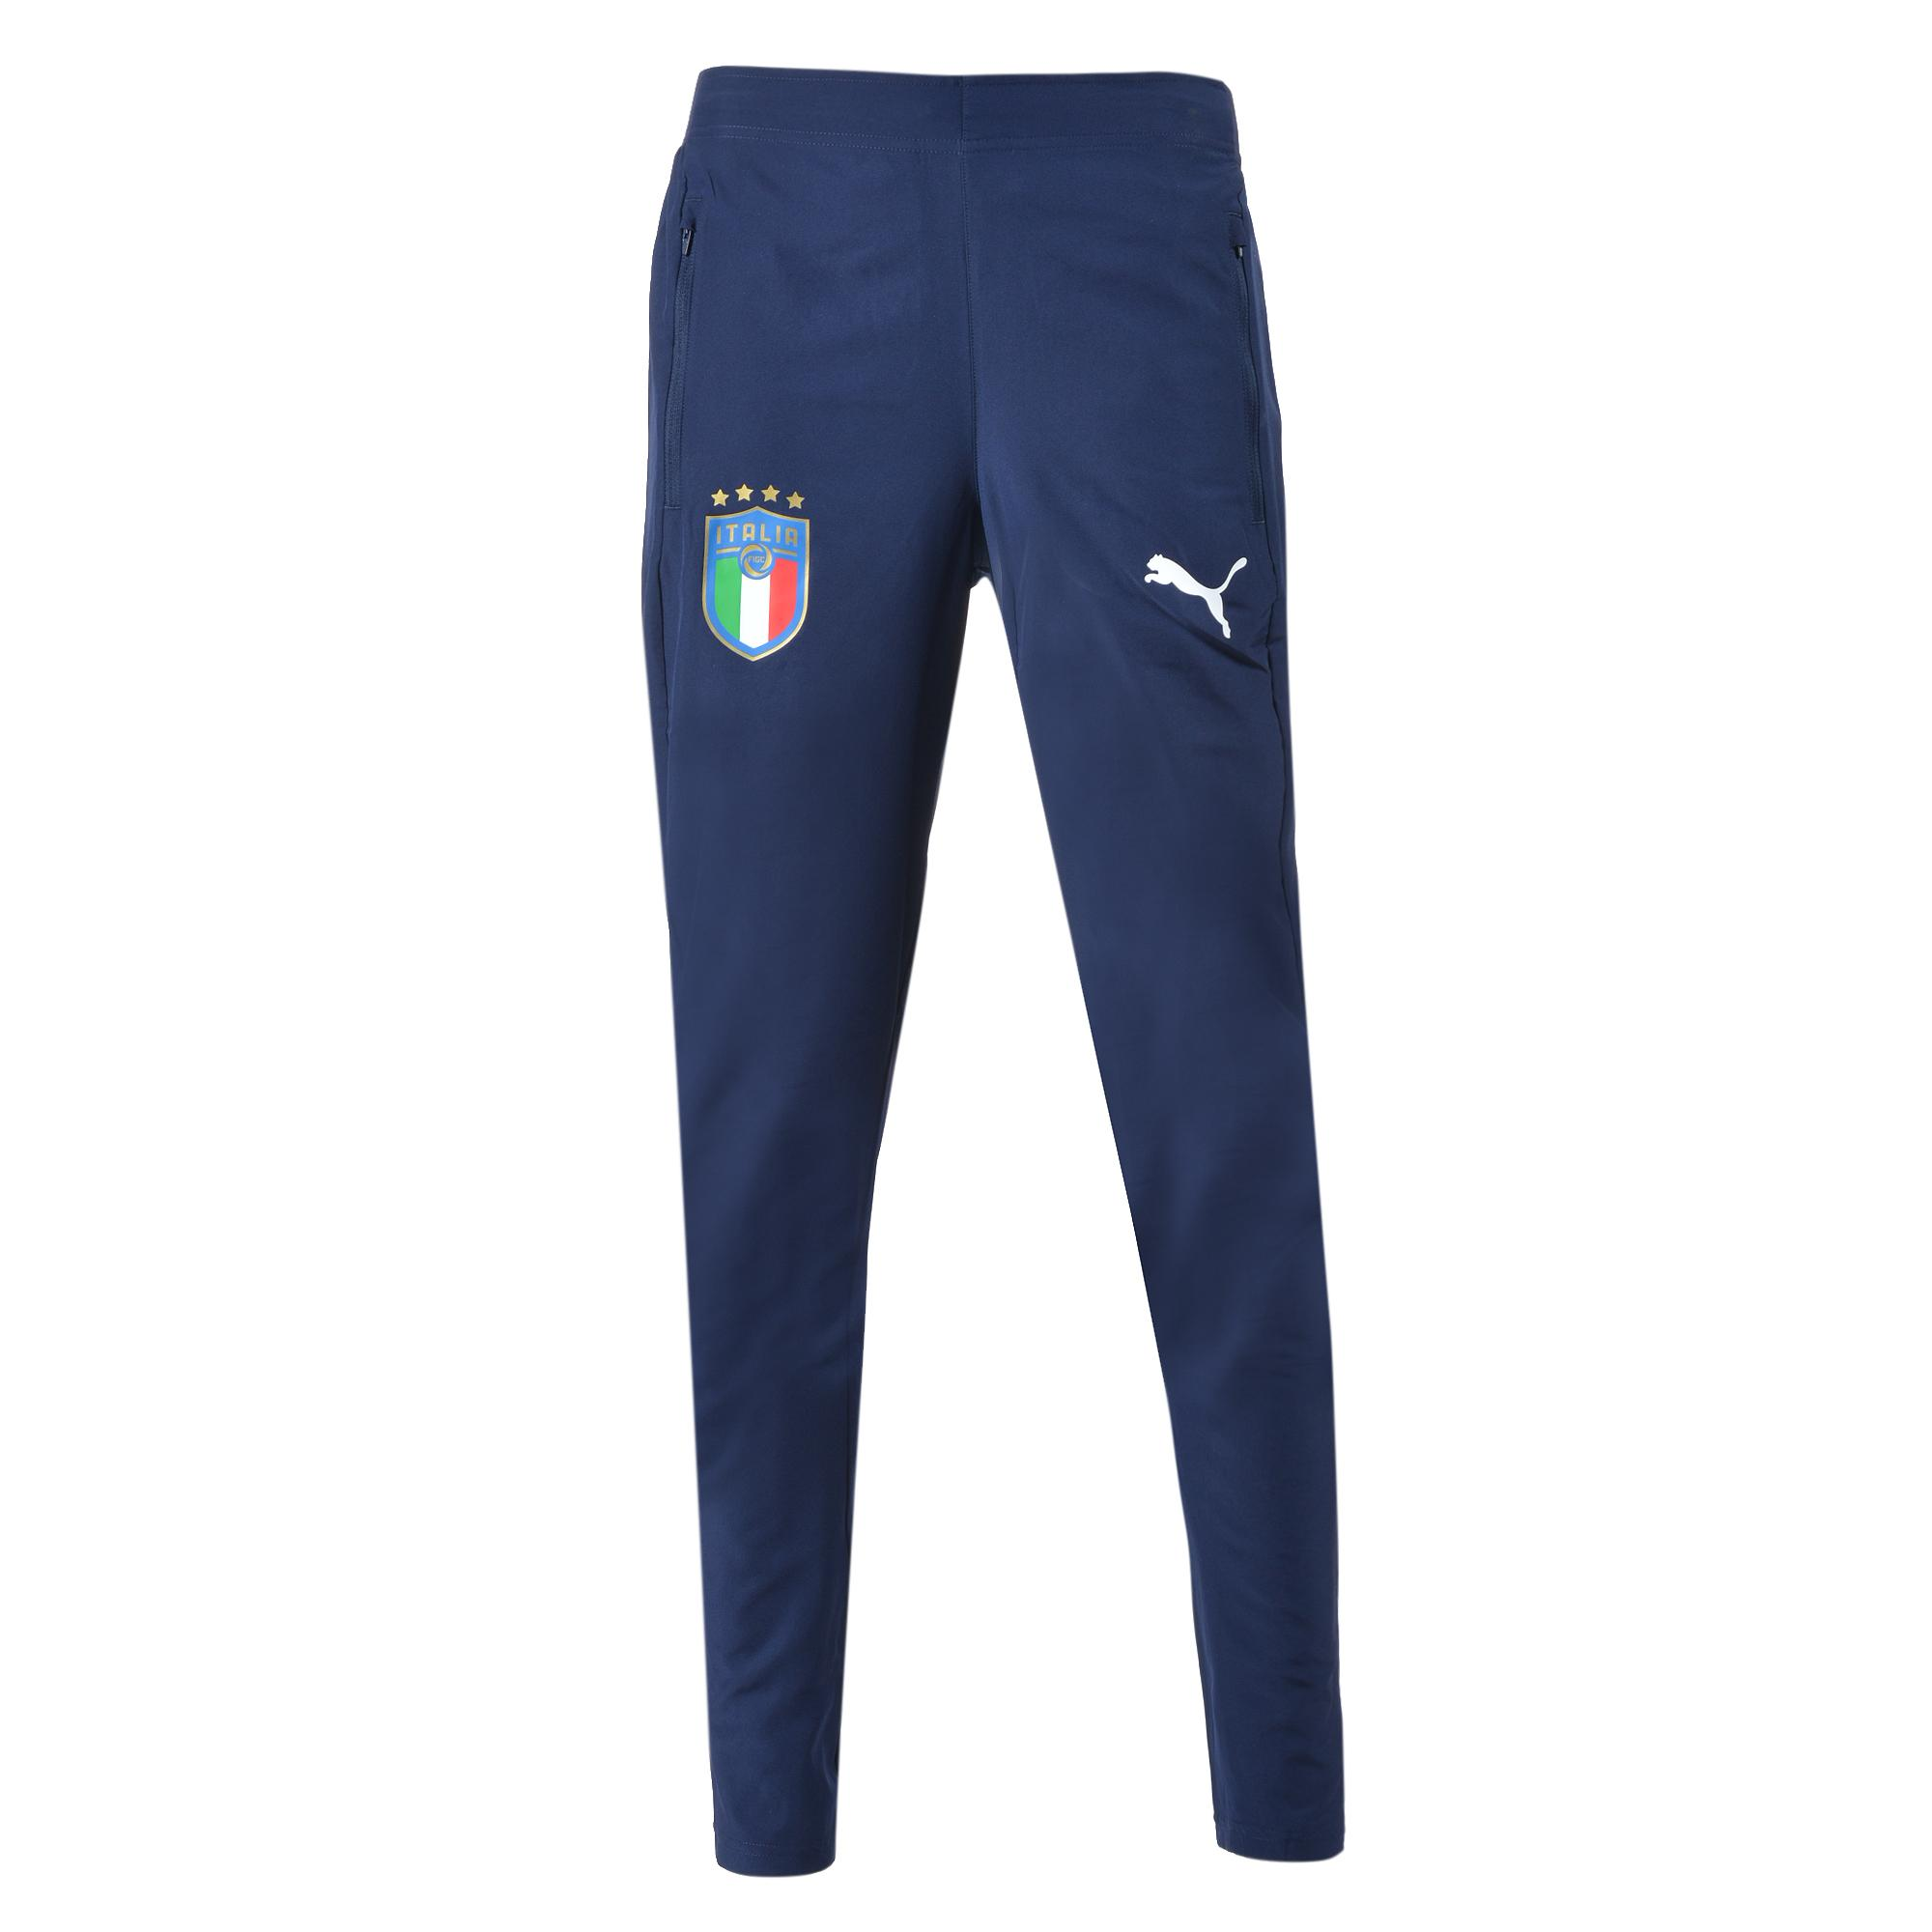 Puma Pantalone Figc Woven Pants Italia